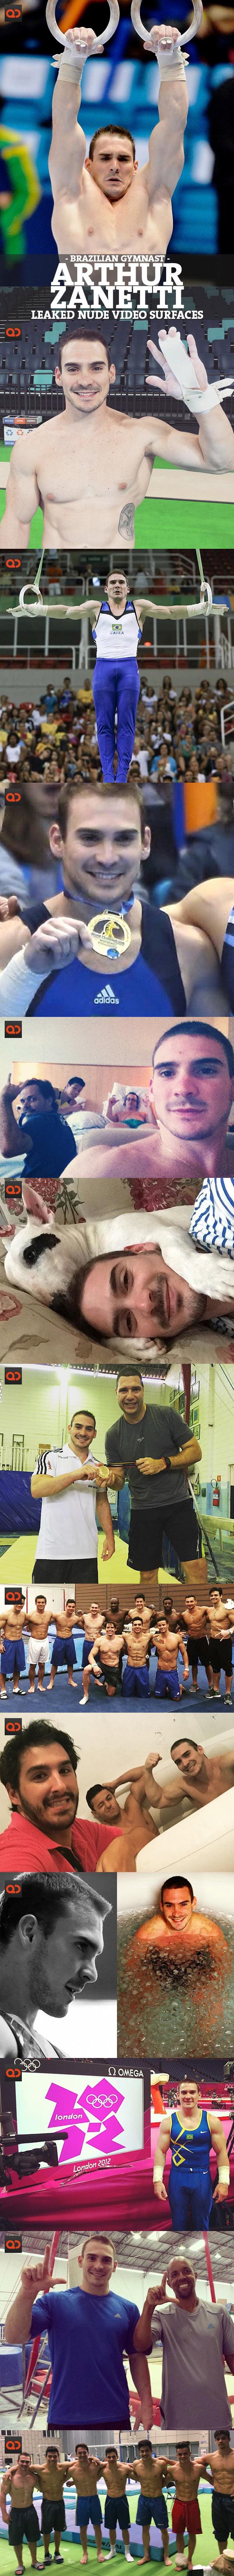 Arthur Nory Sex brazilian gymnasts arthur zanetti and sergio sasaki leaked